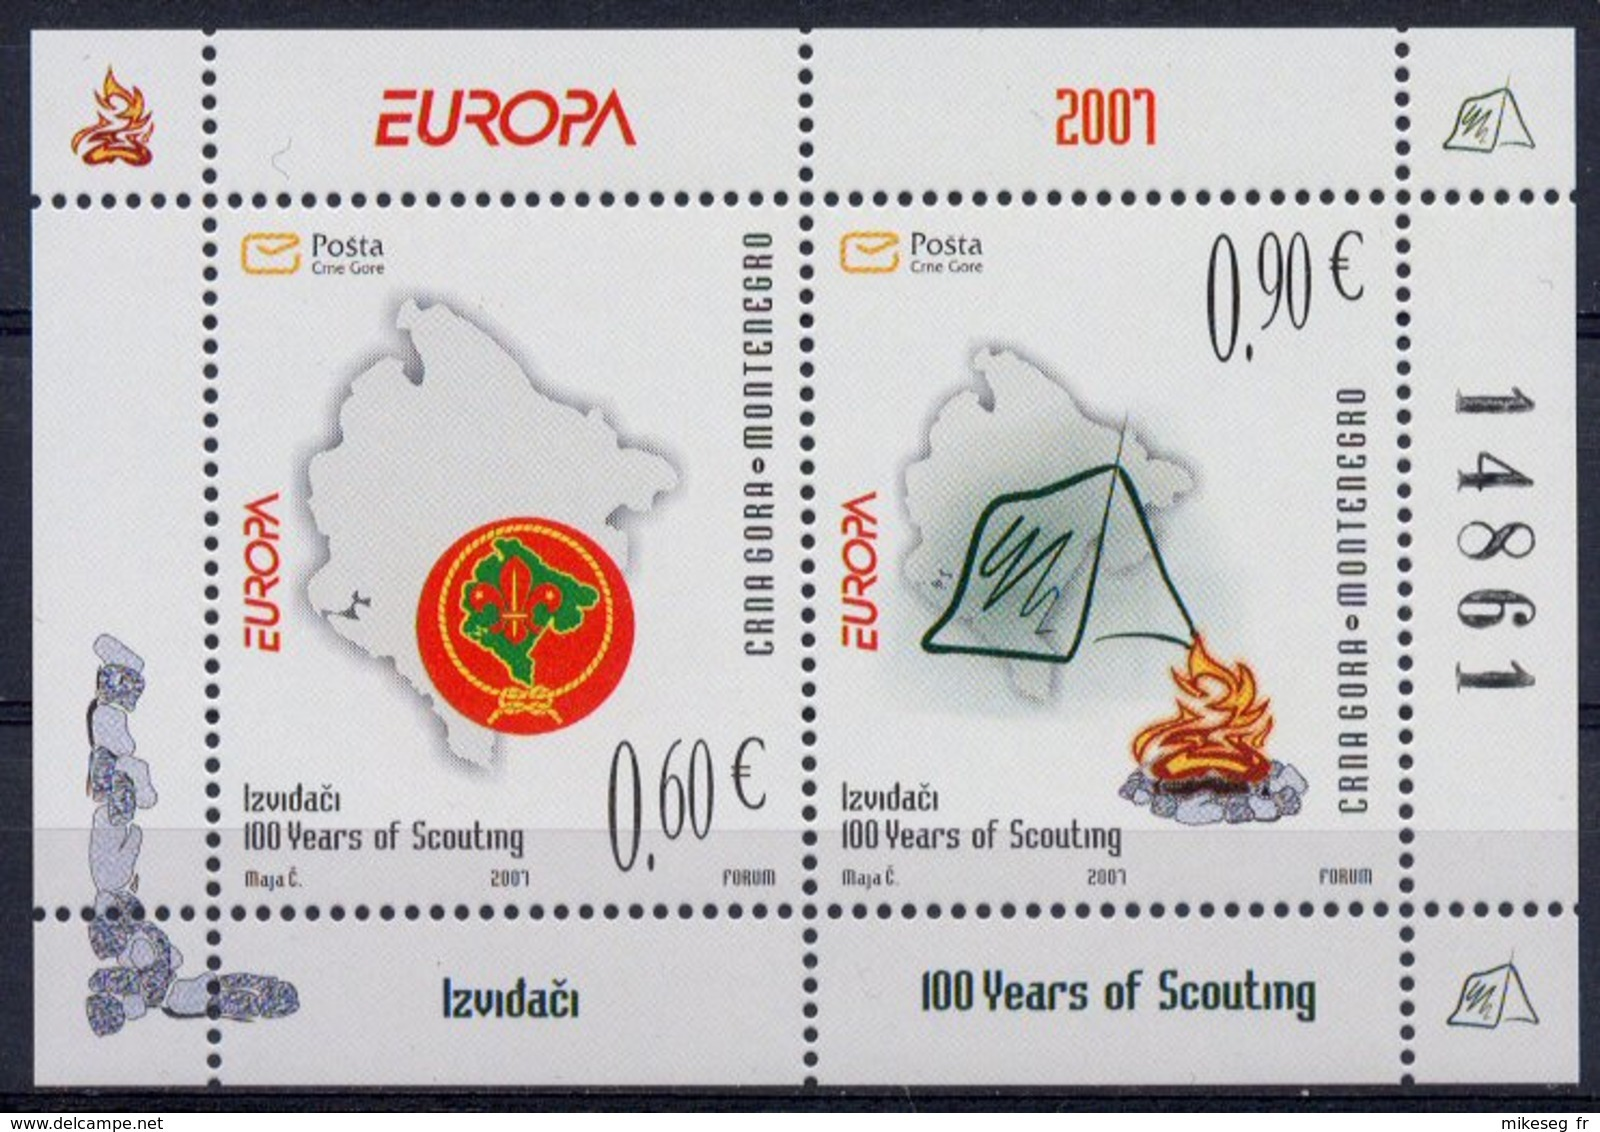 Europa 2007 - CRNA GORA Montenegro (scoutisme) ** - Europa-CEPT